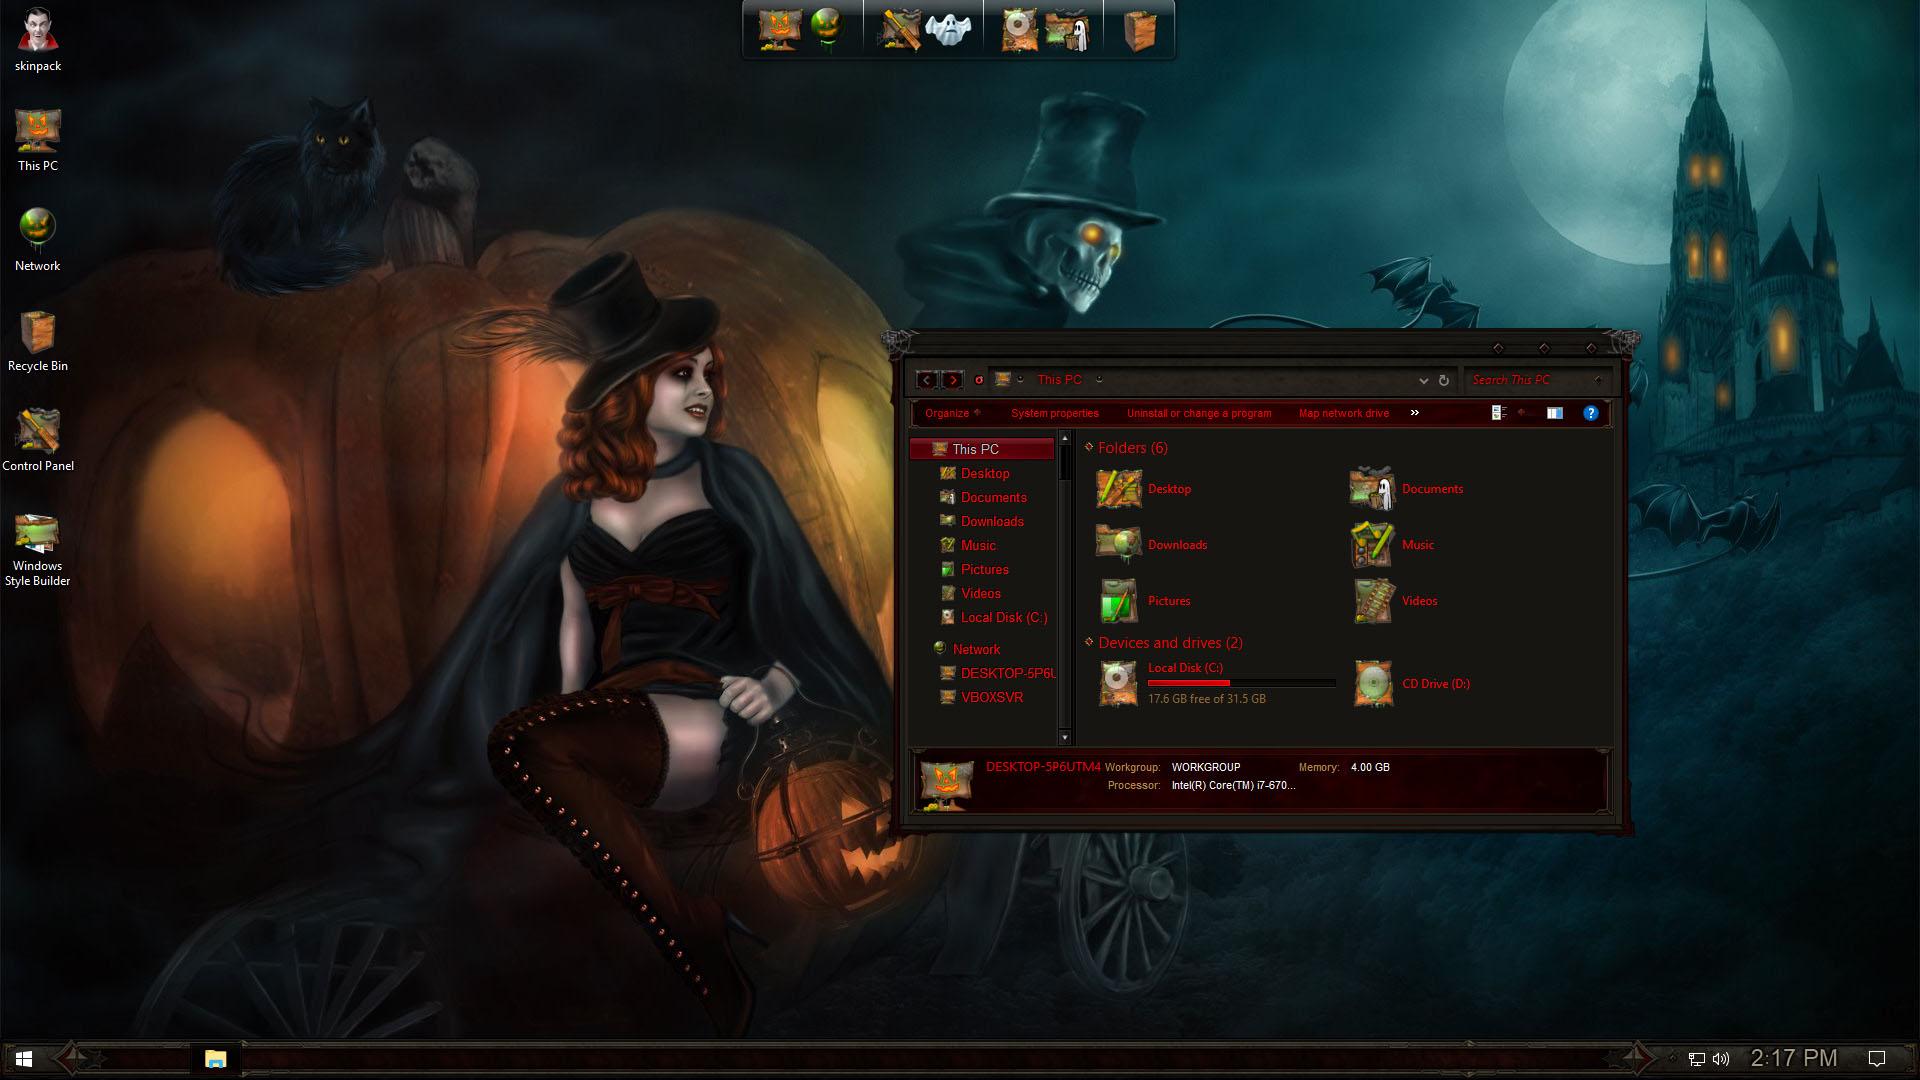 Halloween SkinPack for Windows 7\8.1\10 RS5